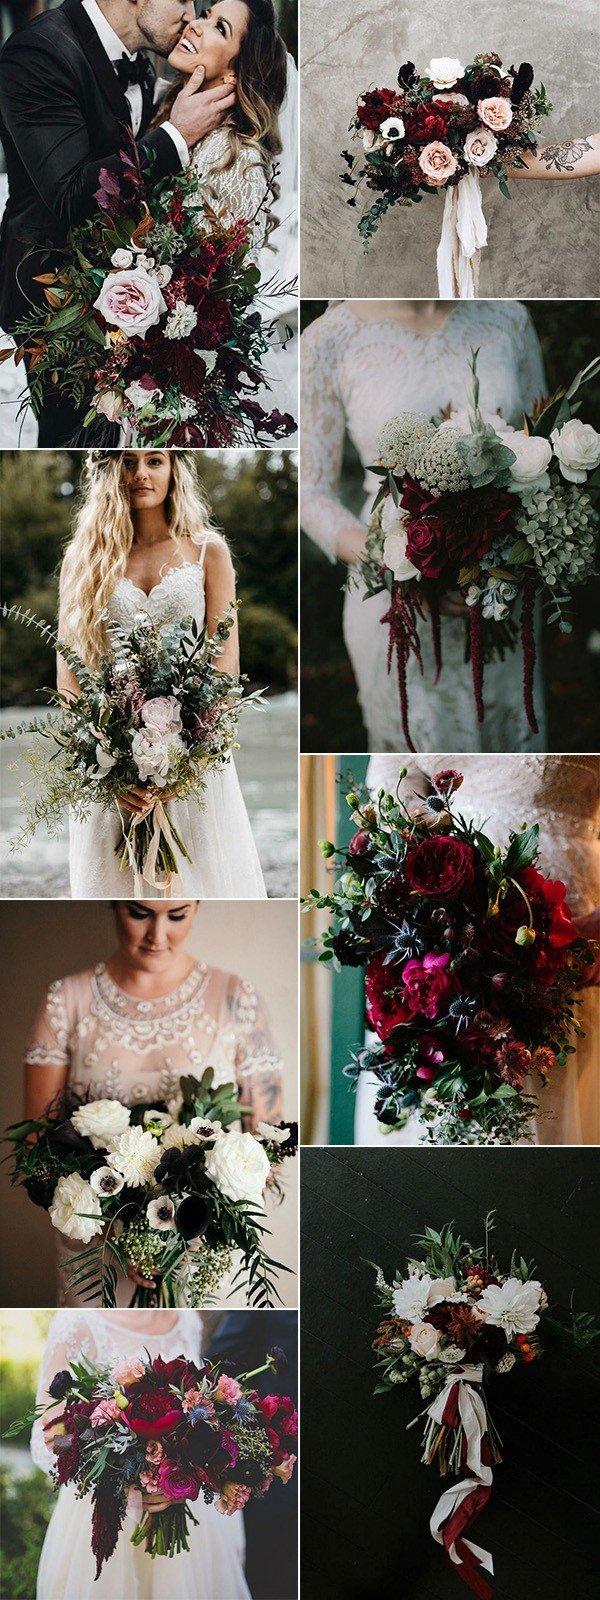 trending moody wedding bouquet ideas